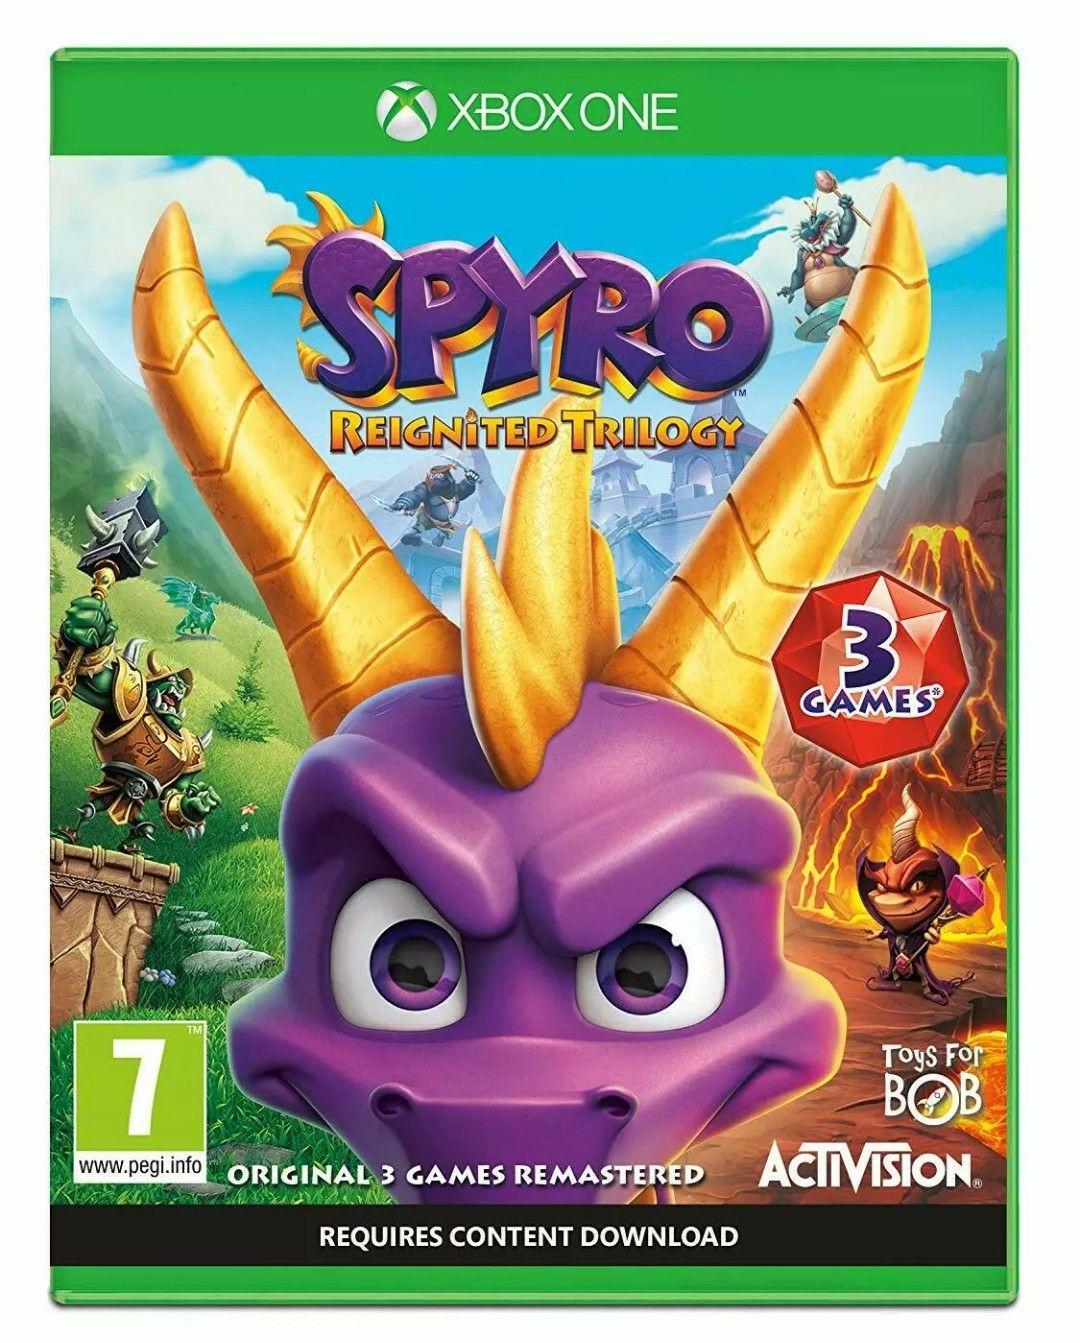 Spyro Trilogy Reignited (Xbox One) - £13.99 @ Ebay/Boomerang Rentals